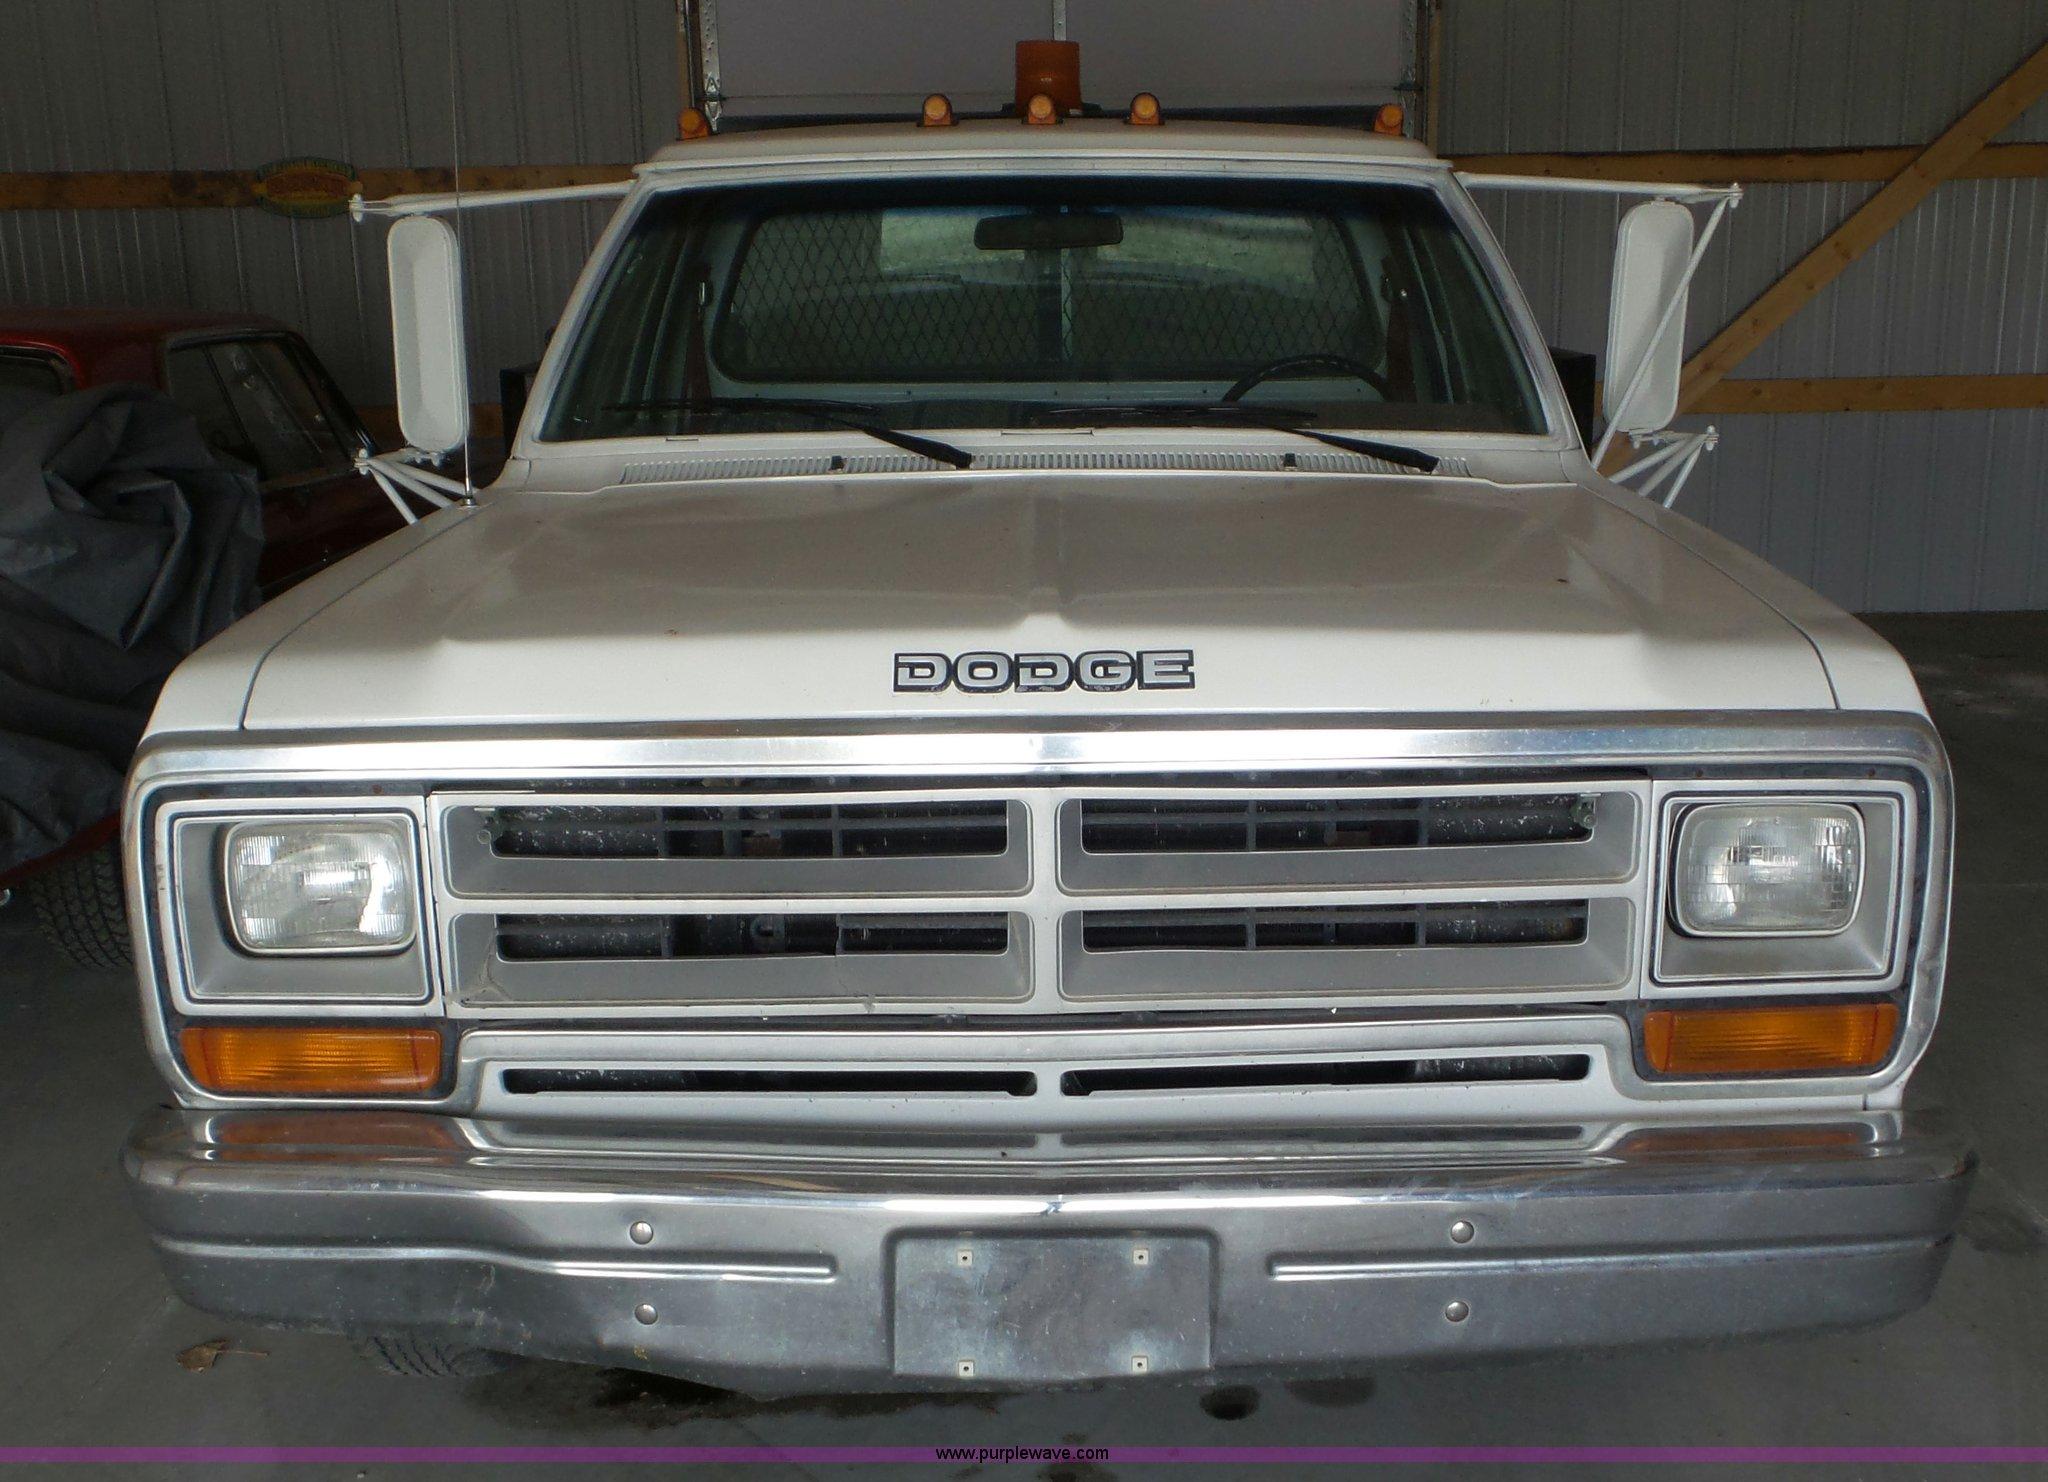 1988 Dodge D350 Flatbed Pickup Truck Item Av9818 Sold A Wiring Full Size In New Window